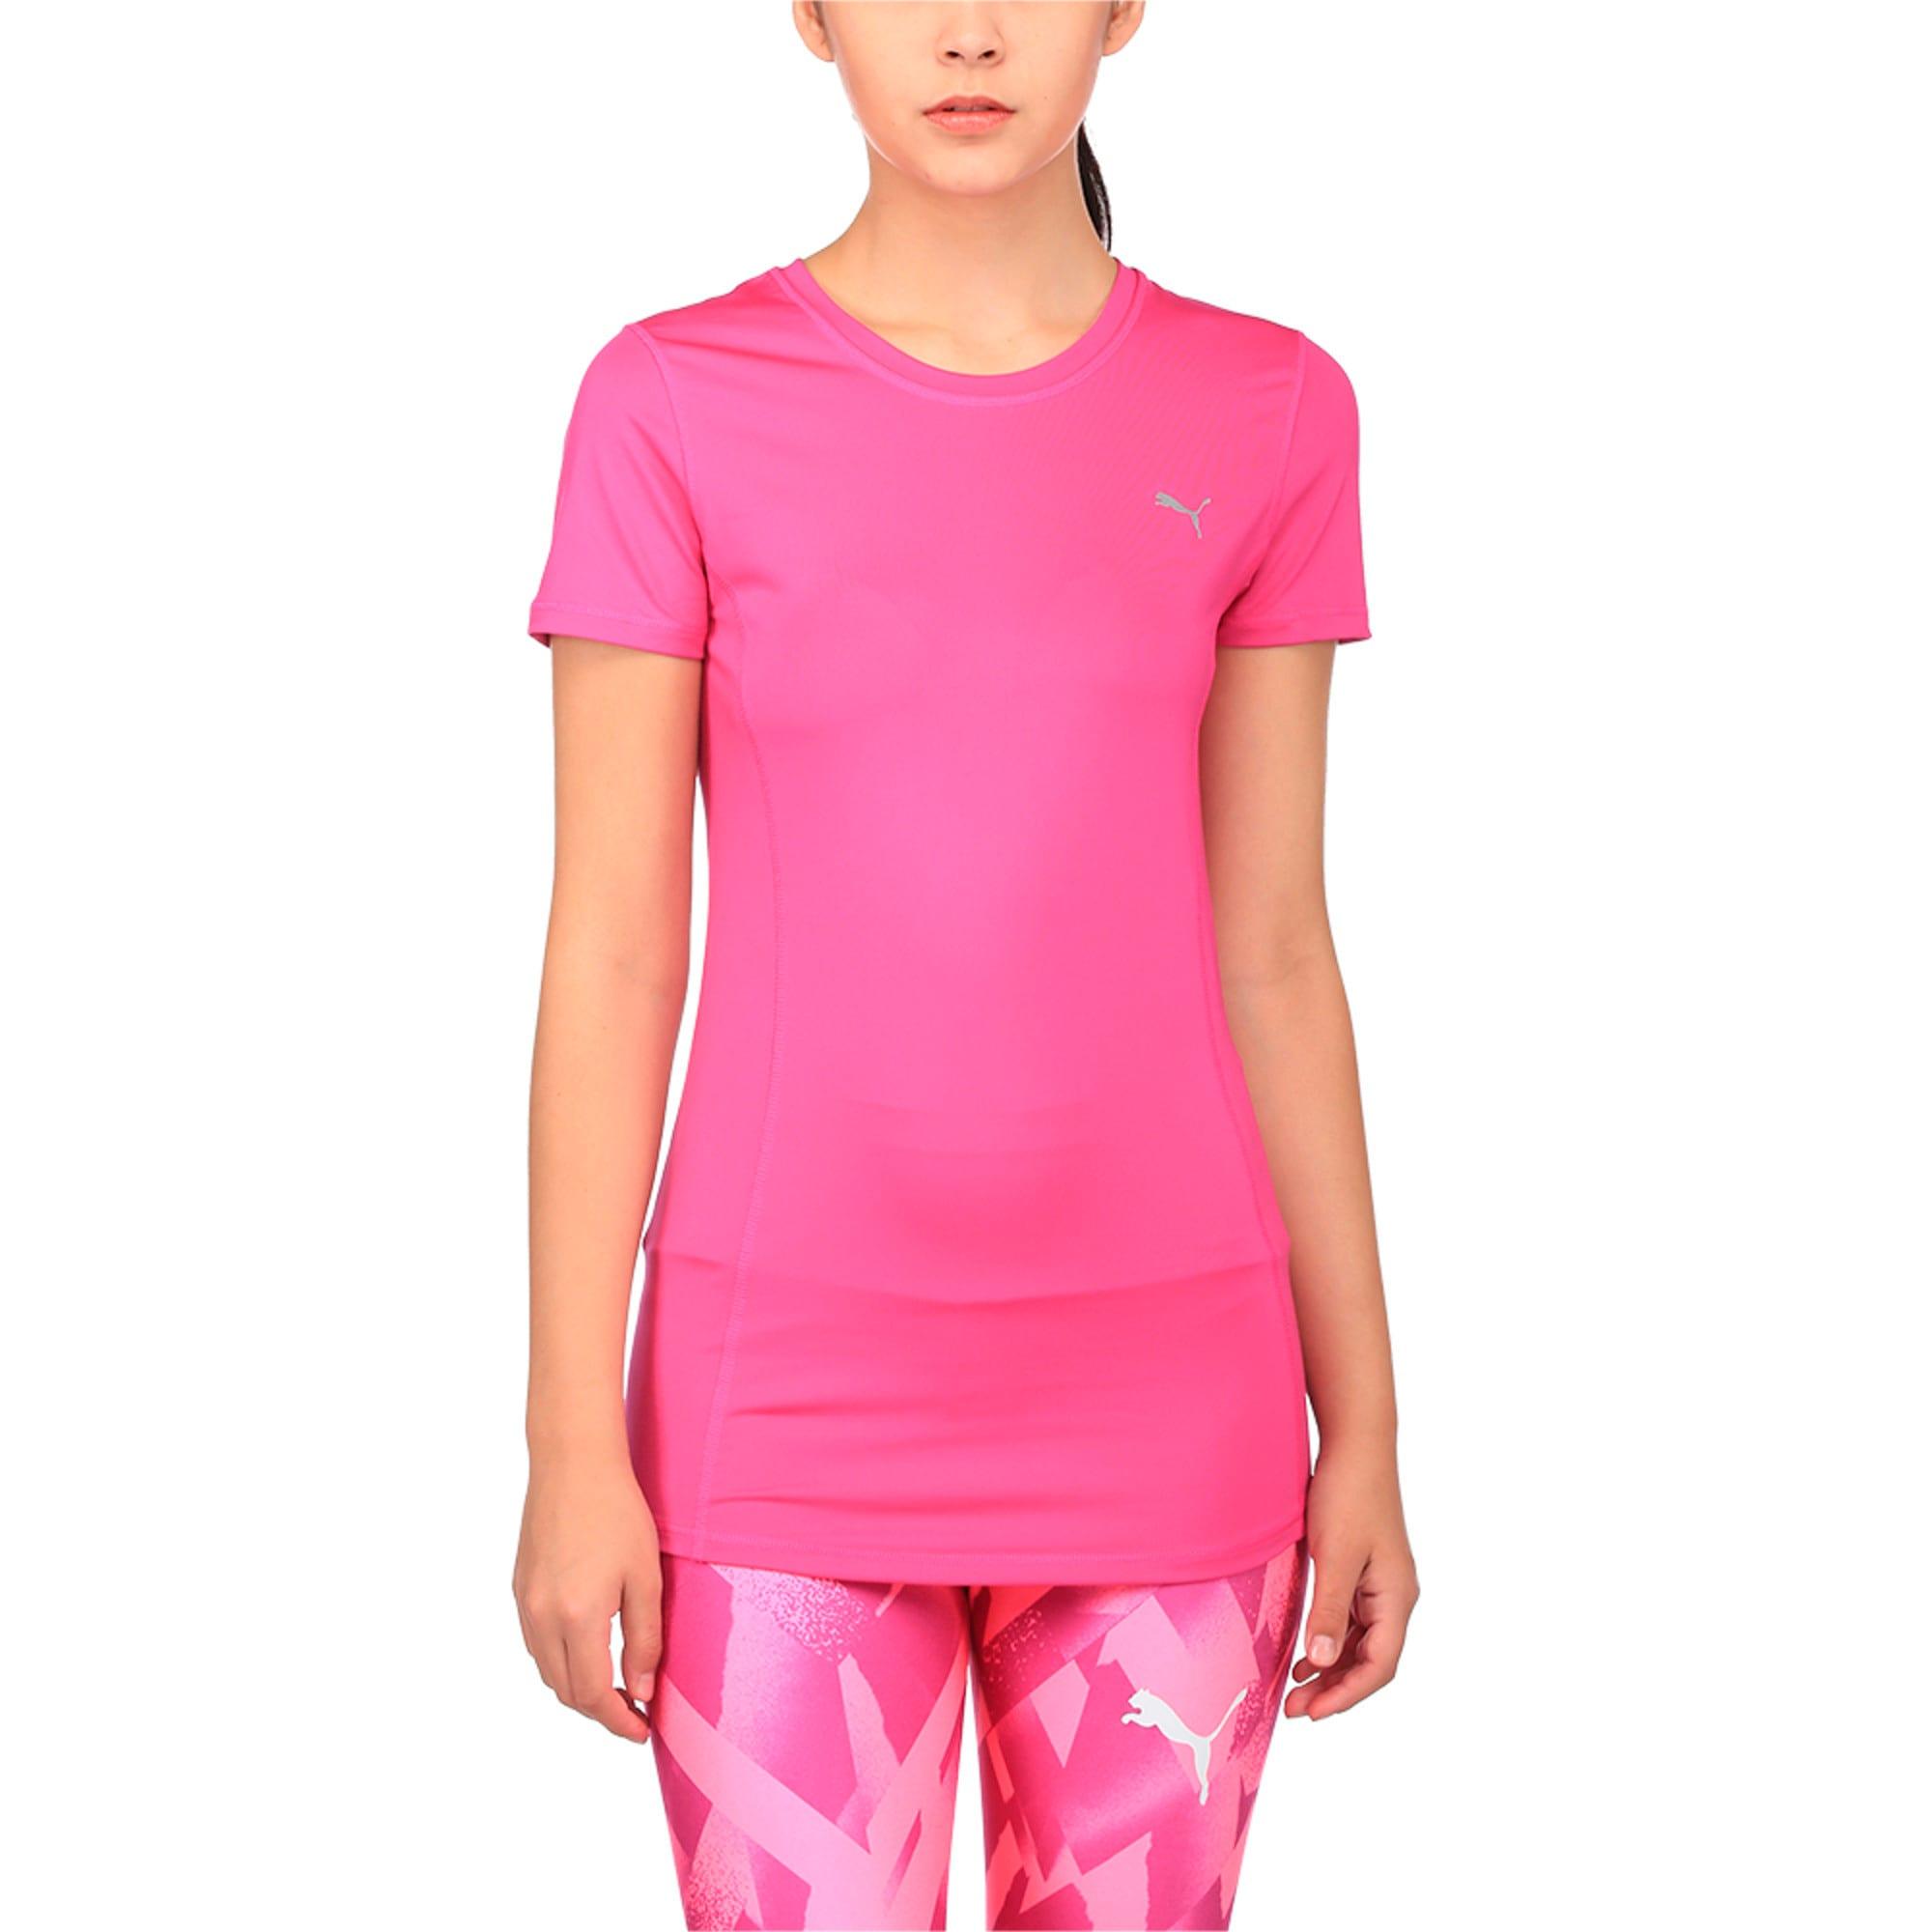 Thumbnail 1 of Training Women's Essential T-Shirt, ULTRA MAGENTA, medium-IND